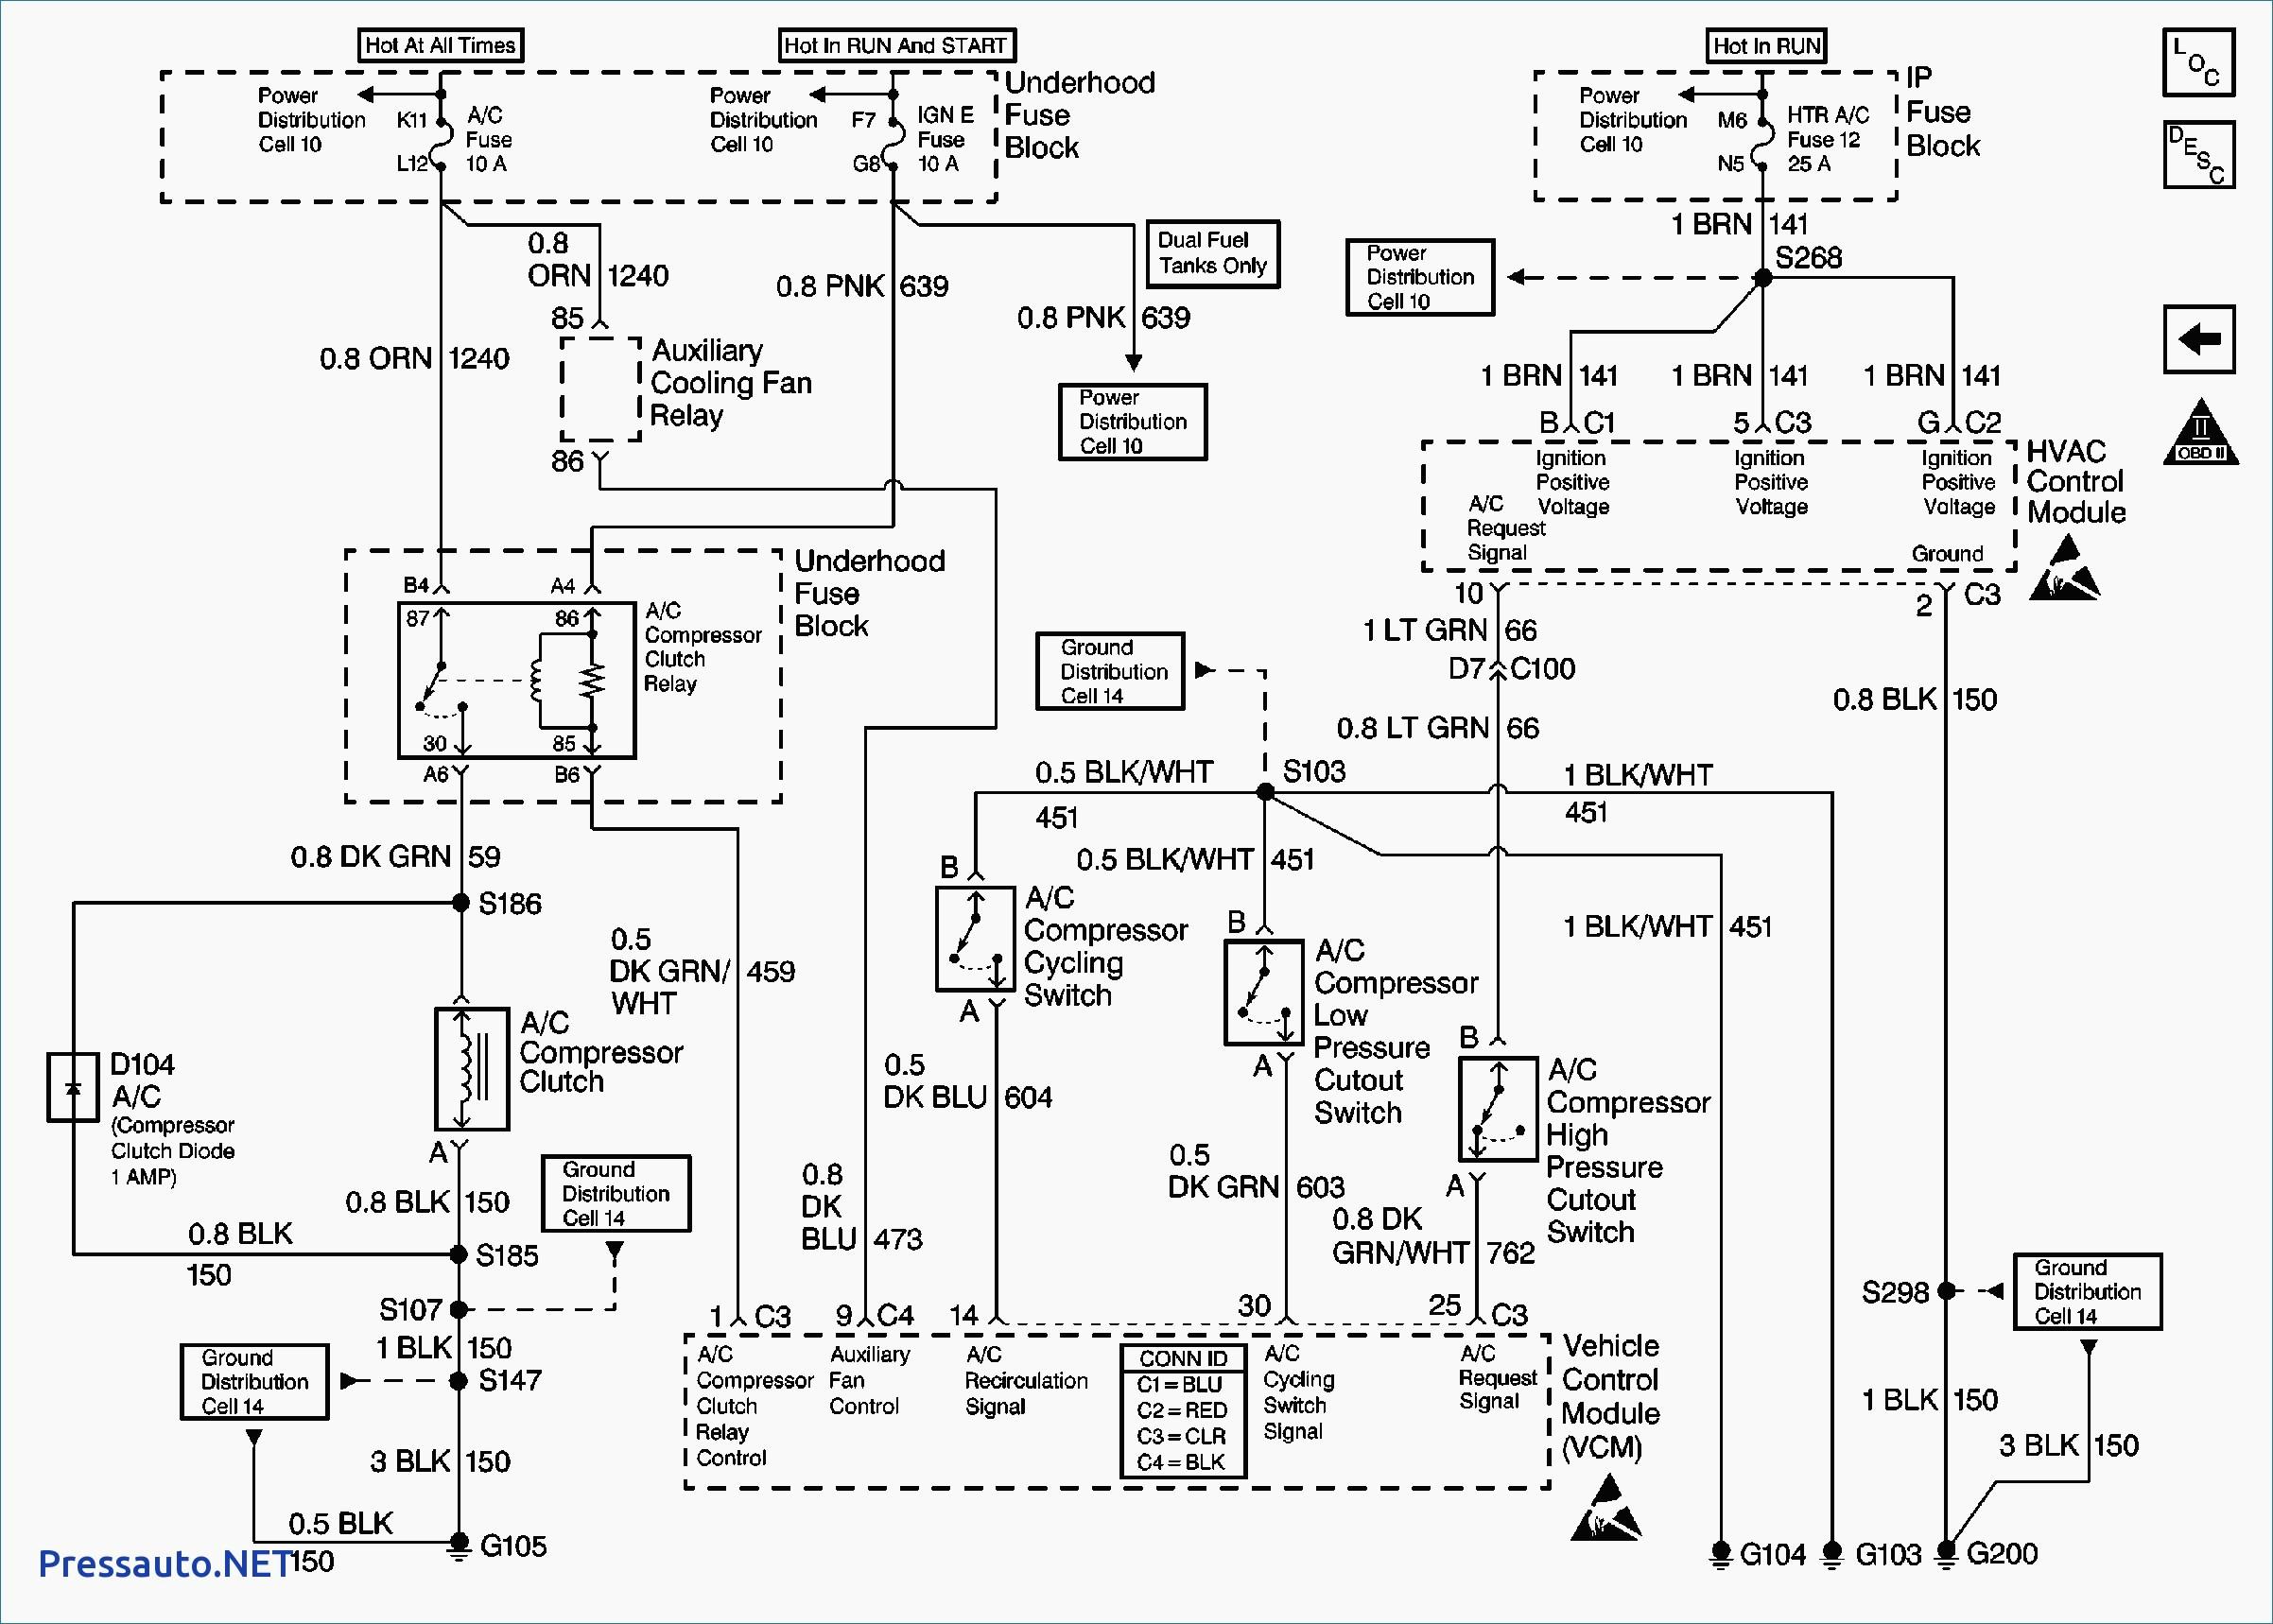 Toyota Previa Engine Diagram 1992 Pontiac Grand Am Engine Diagram Wiring Schematic Worksheet Of Toyota Previa Engine Diagram